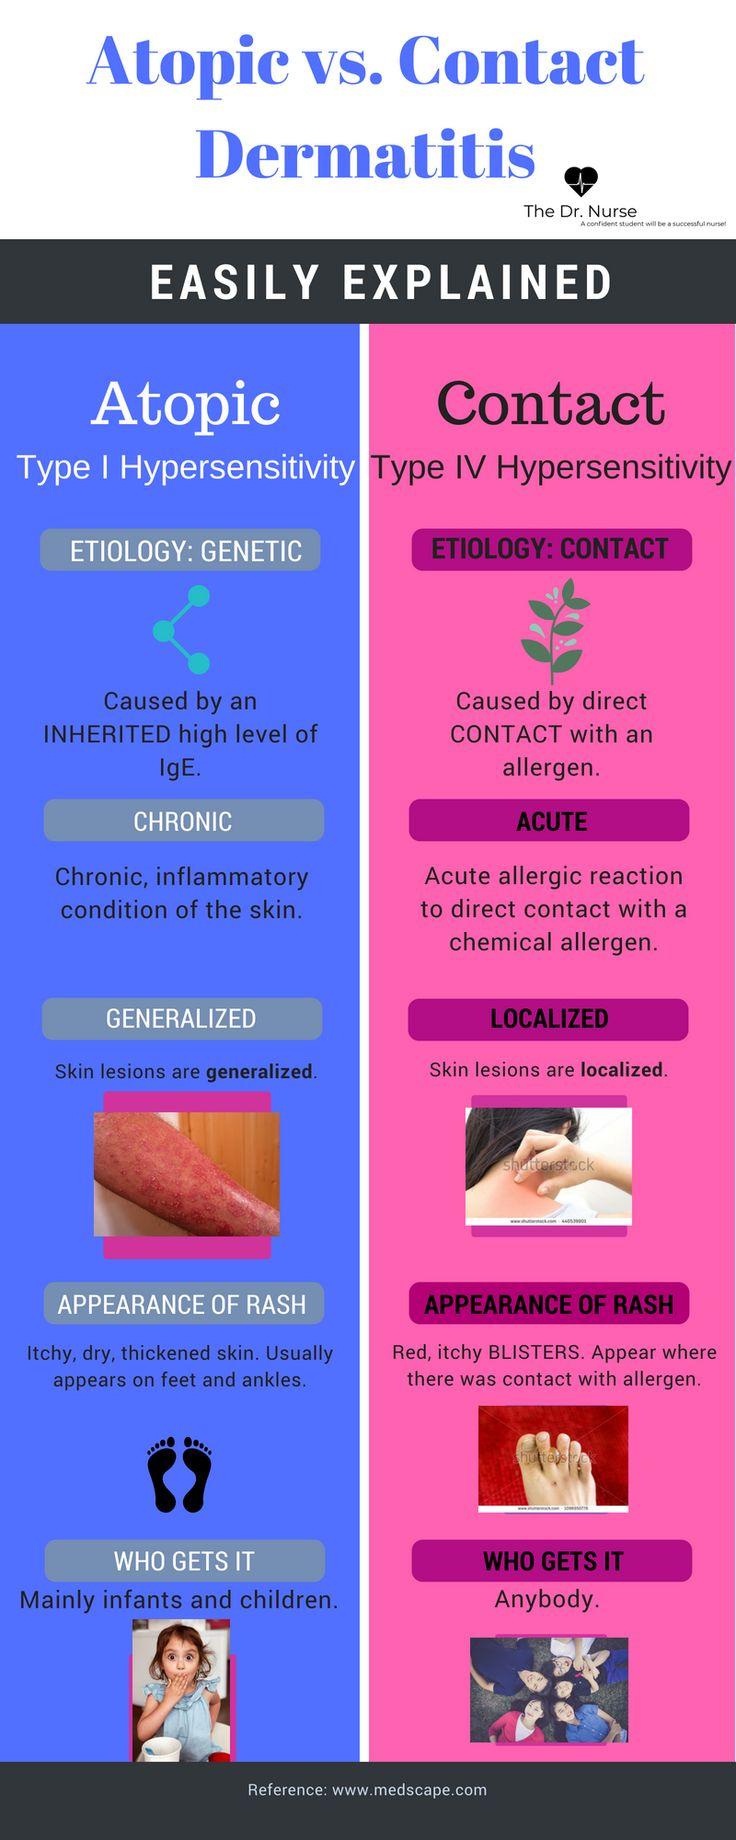 Atopic Dermatitis vs. Contact Dermatitis.png Dermatology